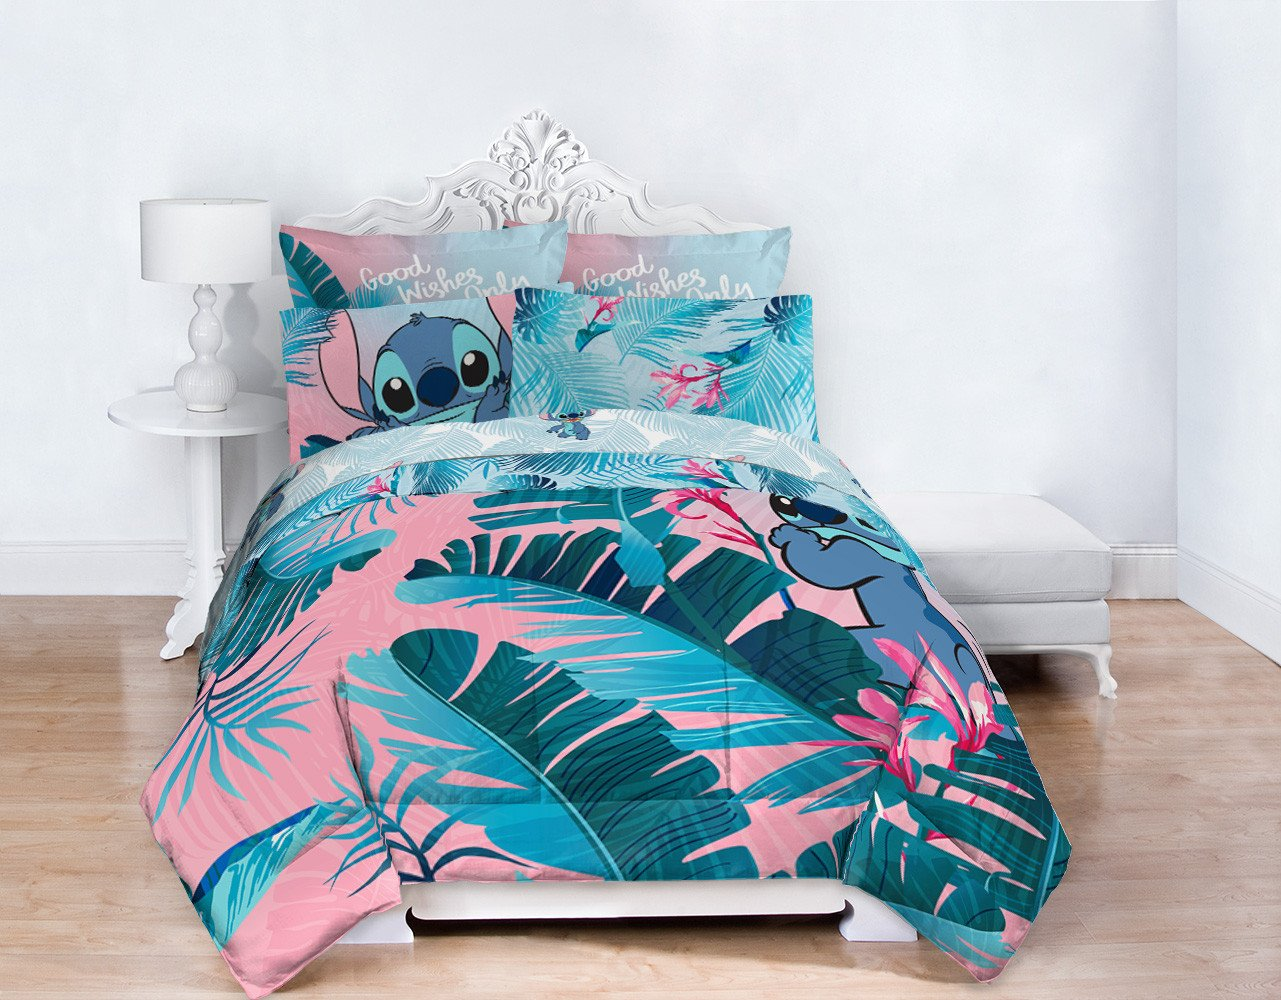 Sofia Vergara Bedroom Set Elegant Lilo & Stitch Floral Fun Queen Bed Set Walmart